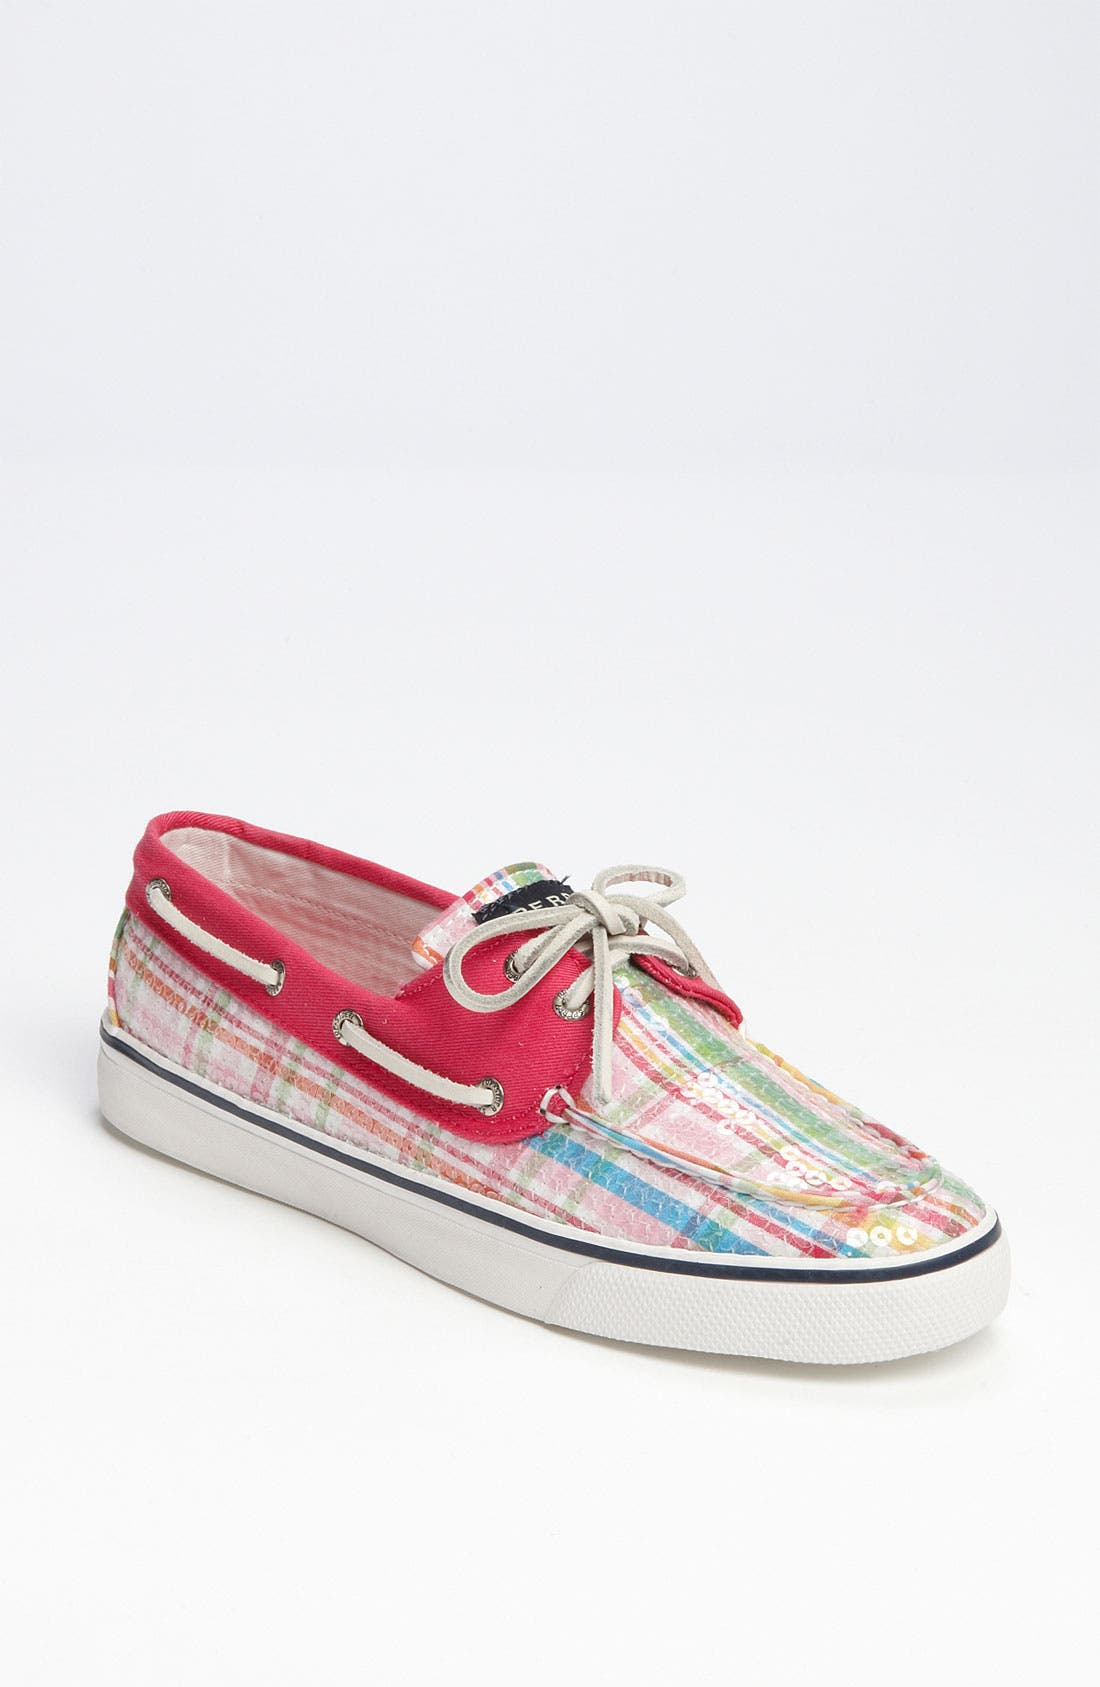 Alternate Image 1 Selected - Sperry 'Bahama' Sneaker (Women)